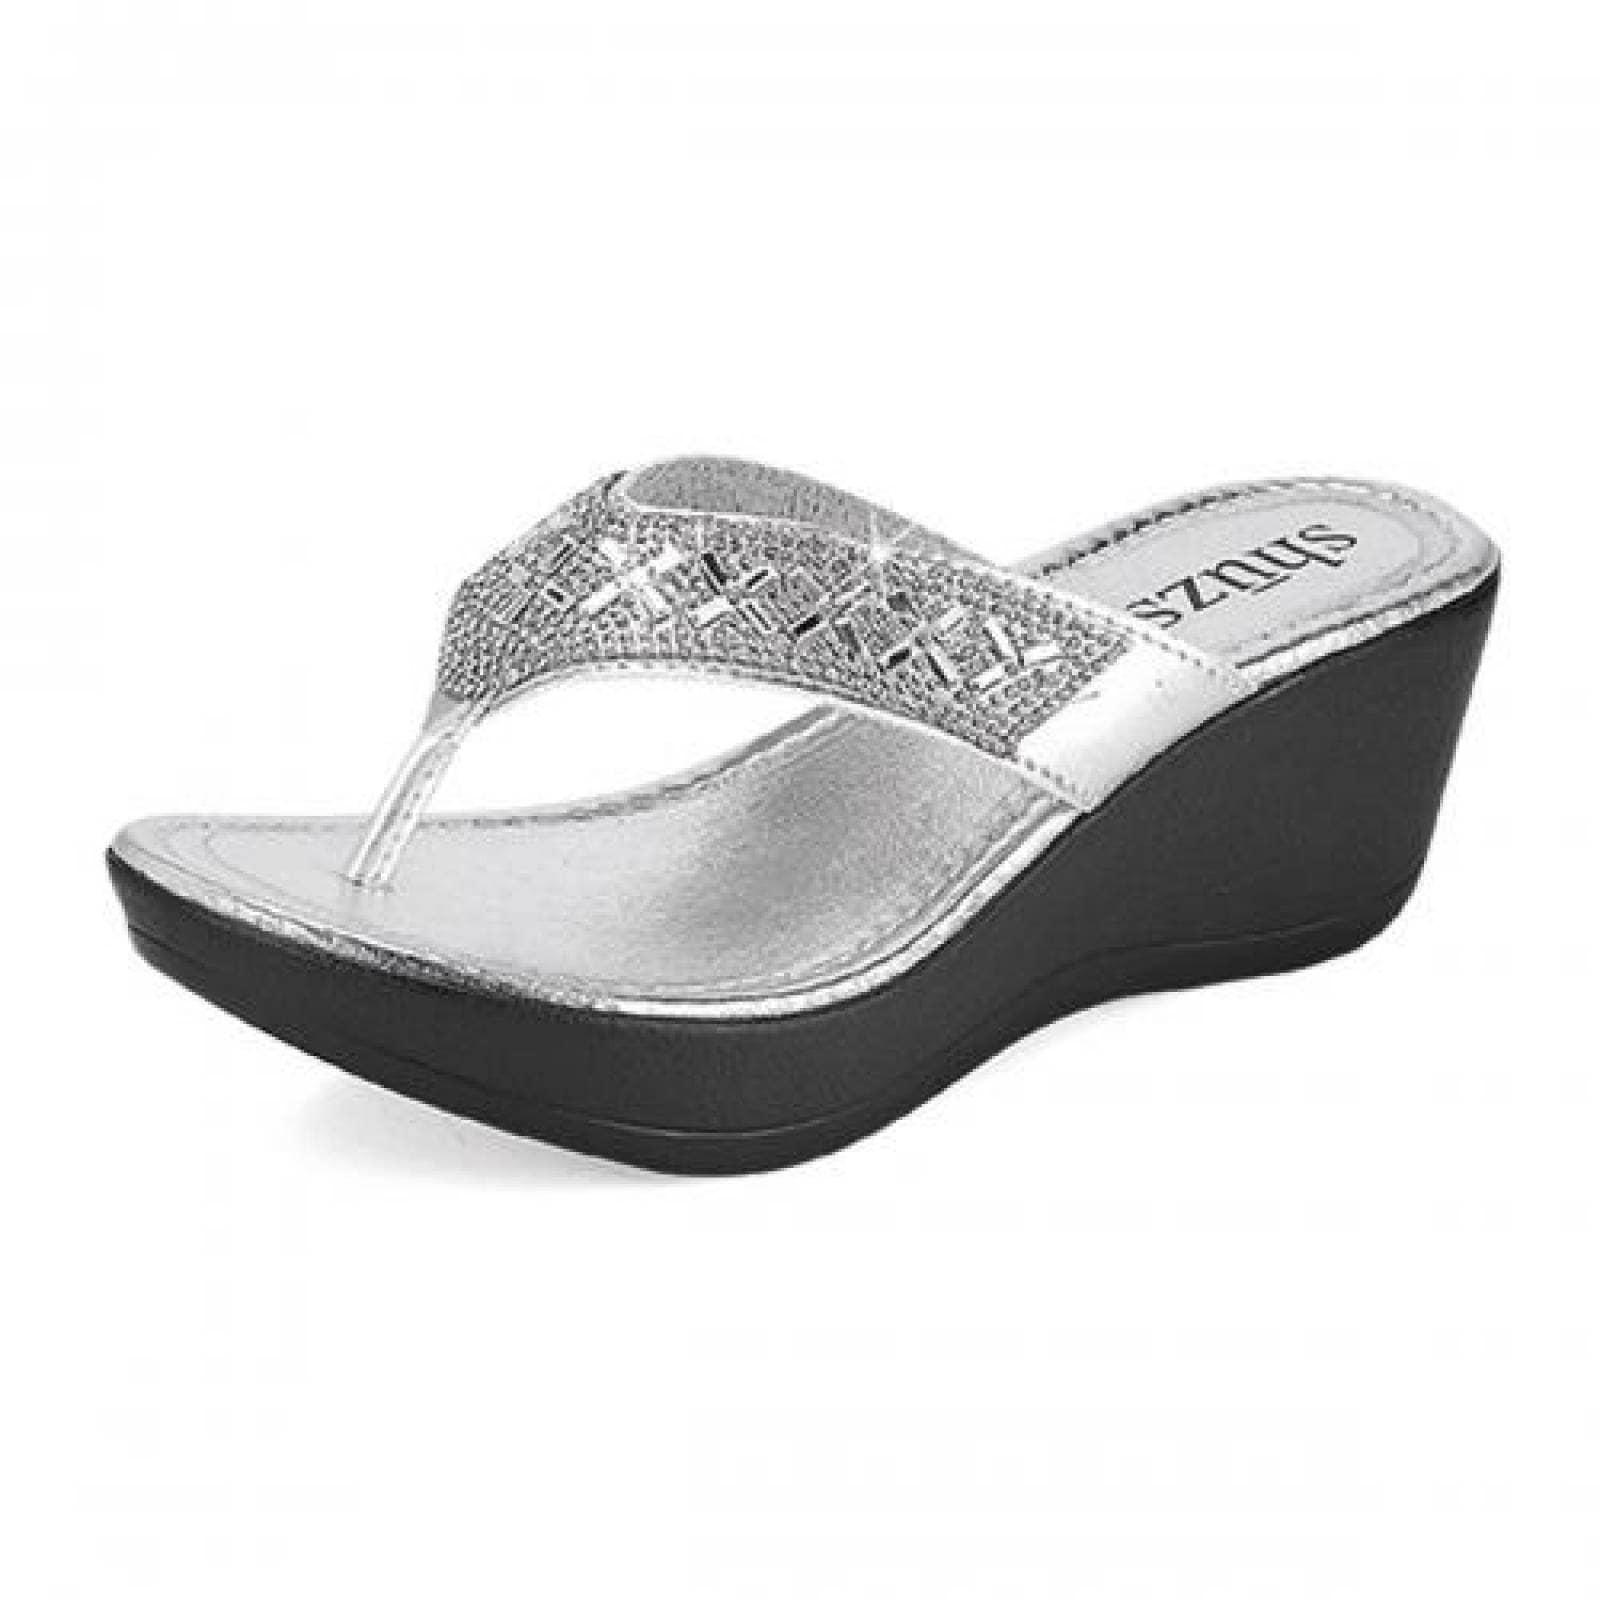 Sandalia para Mujer Shuzs P2409 054931 Color Plata